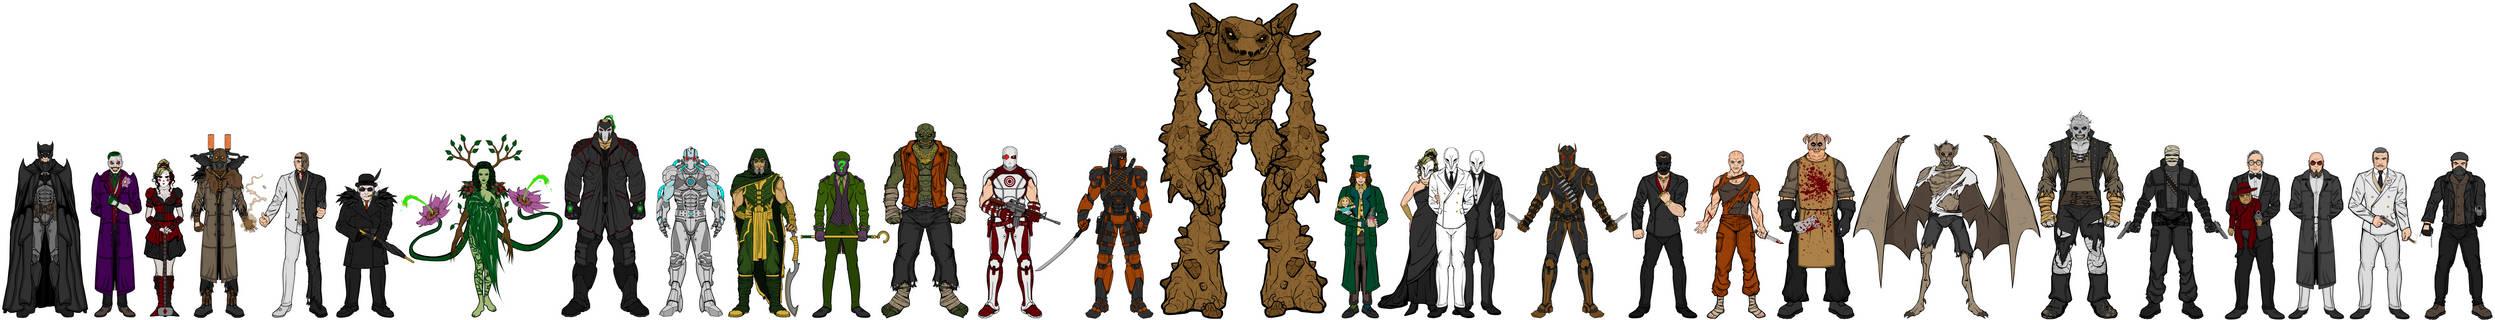 Heromachine: Batman's Rogues Gallery II